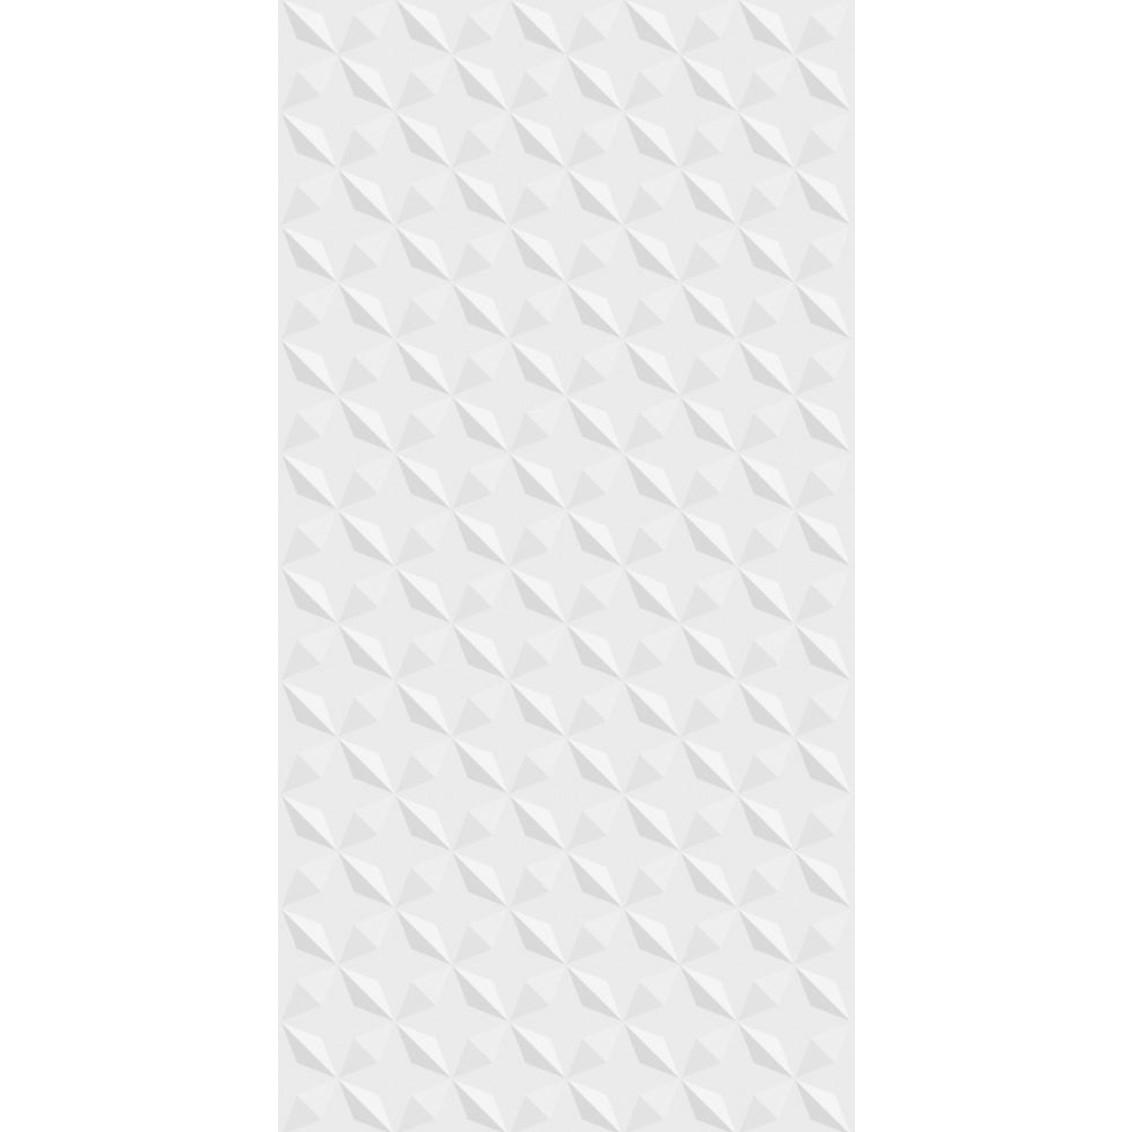 Revestimento Branco Monoporosa 37 X 74 cm Acetinado - Tecnogres